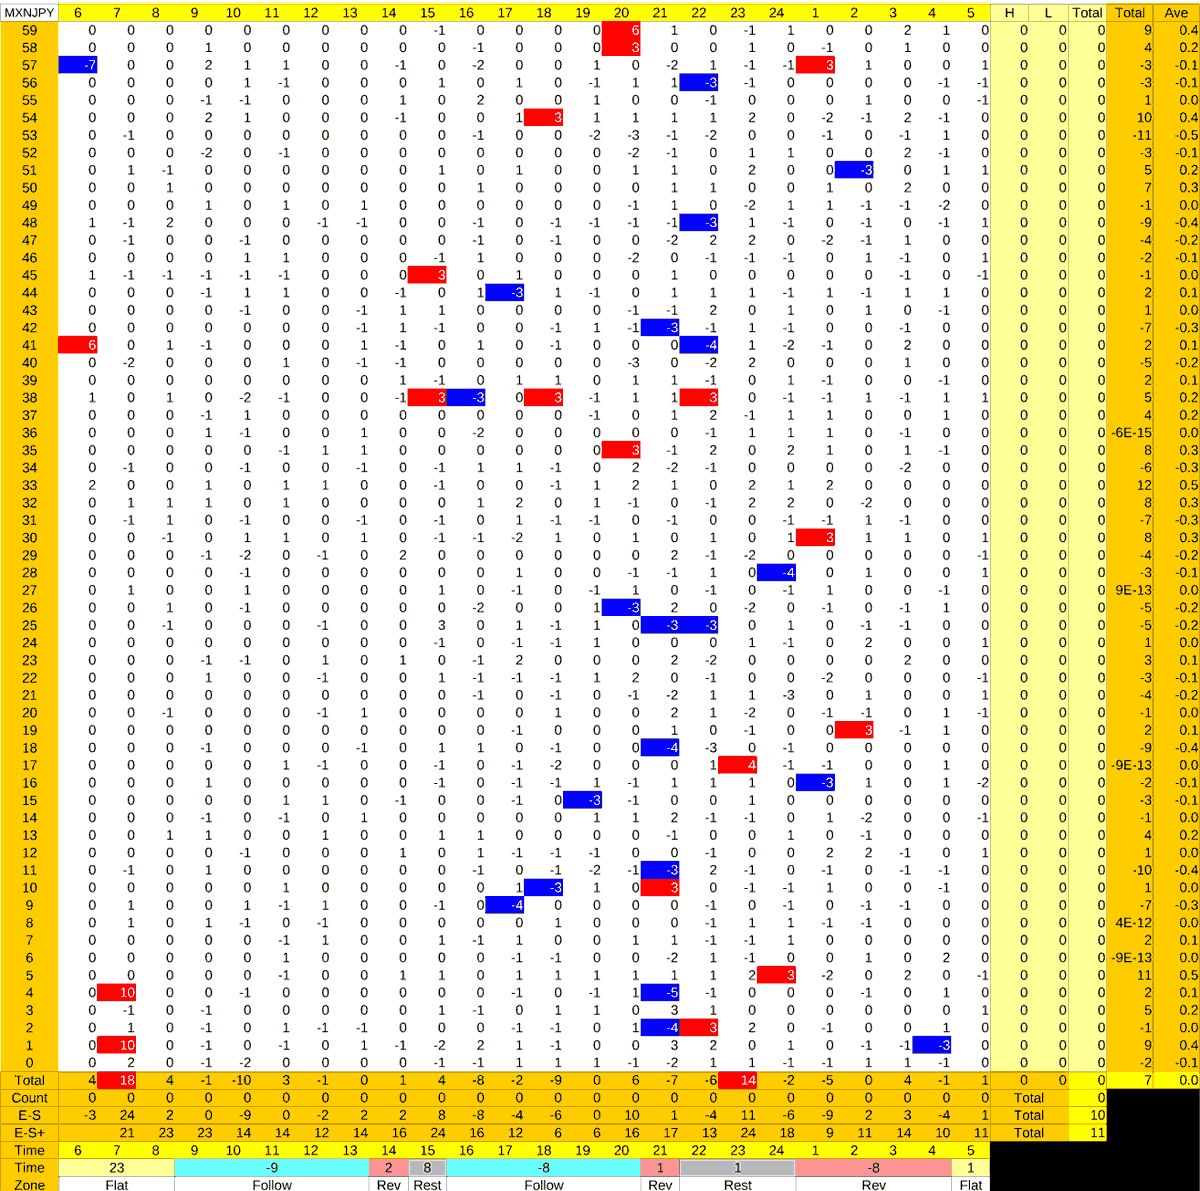 20210628_HS(3)MXNJPY